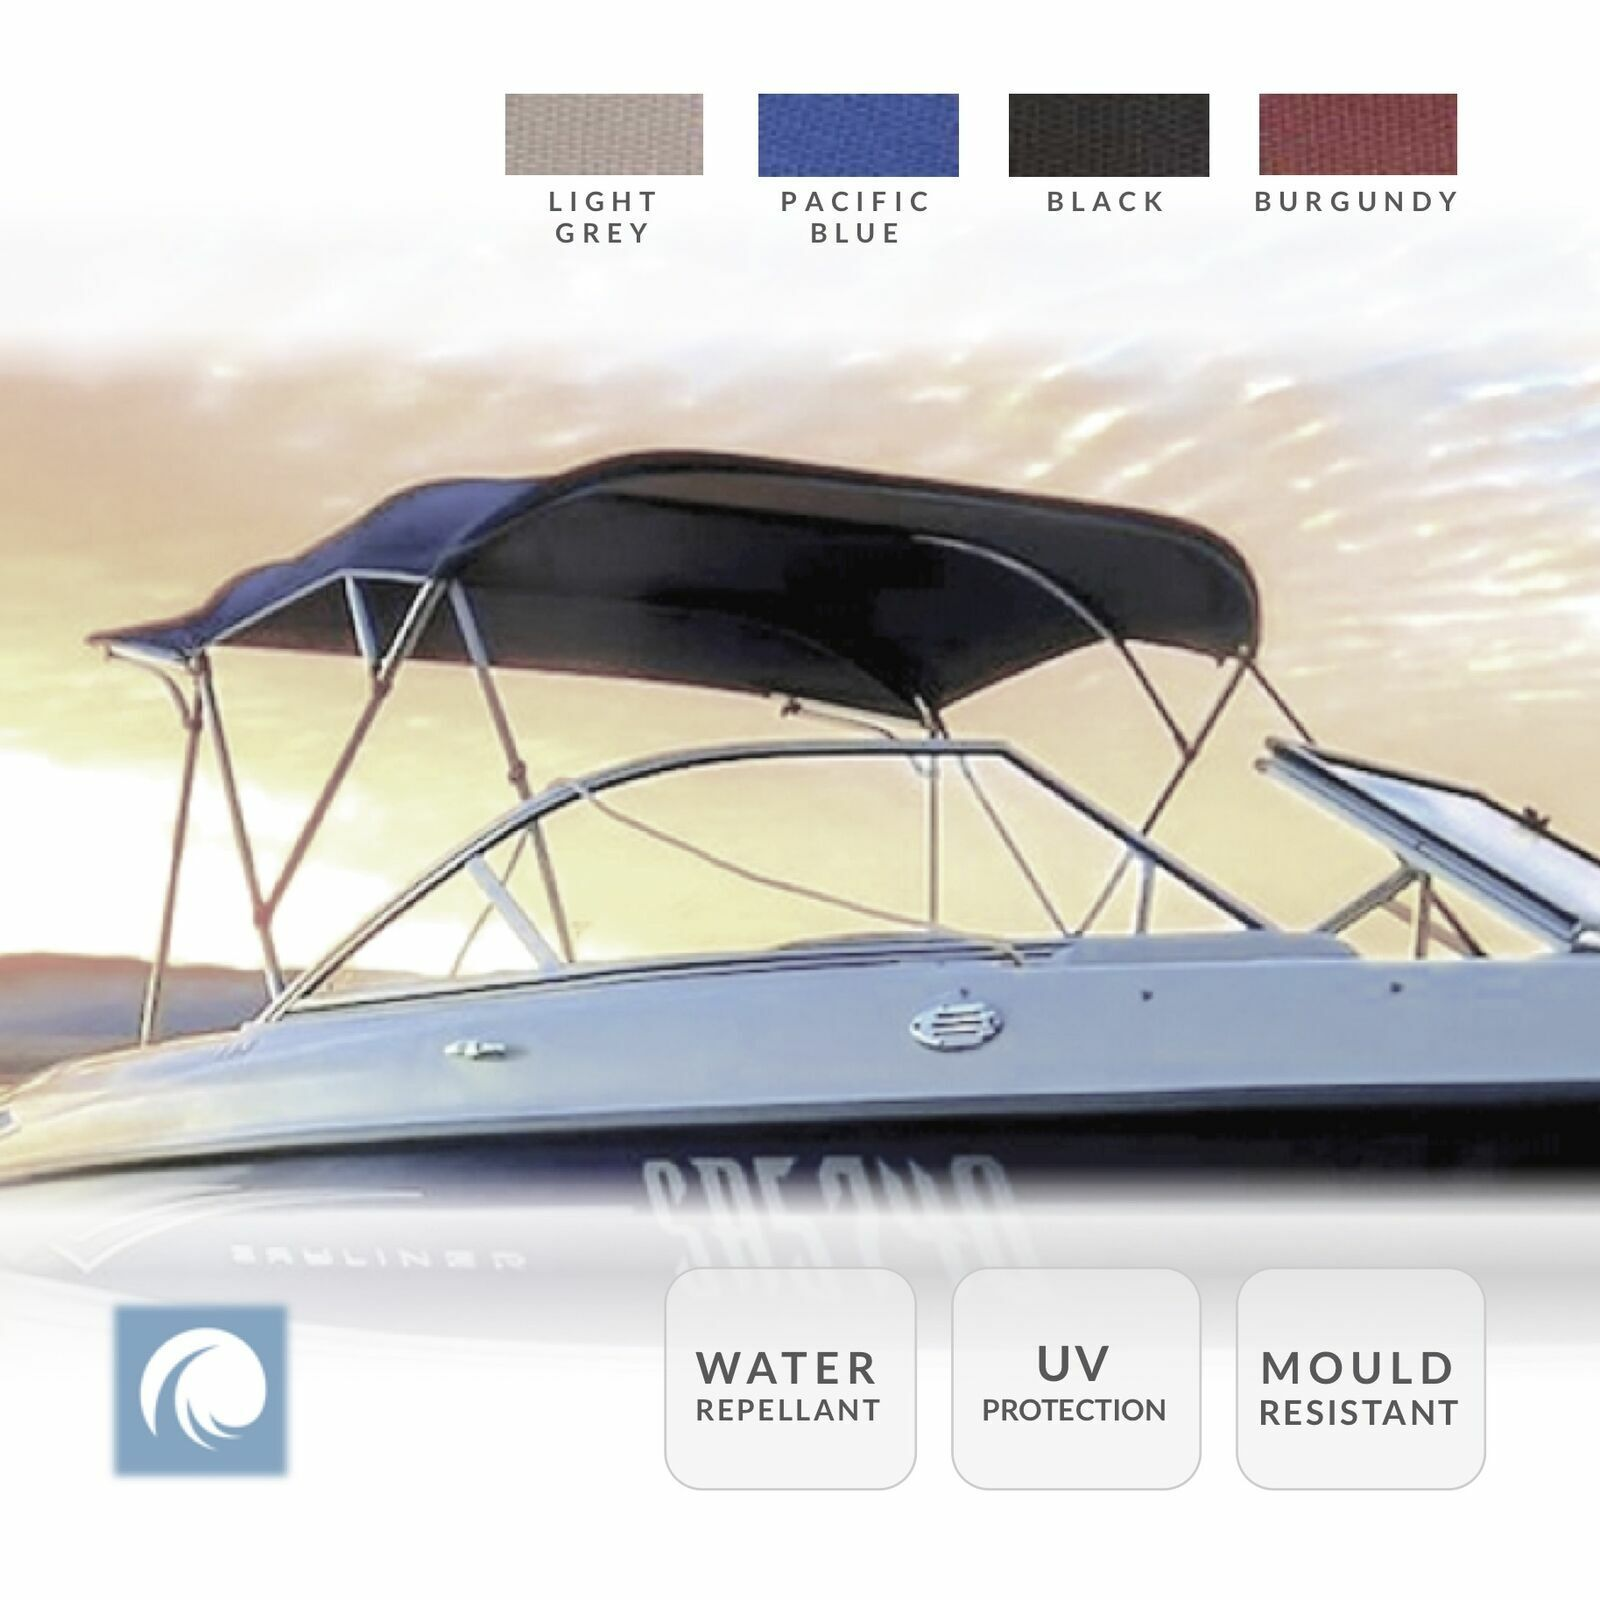 Premium Boat Bimini Top Canopy, 3 Bow, 120cm - 210cm Breite.Wählen Sie Farbe && Größe.